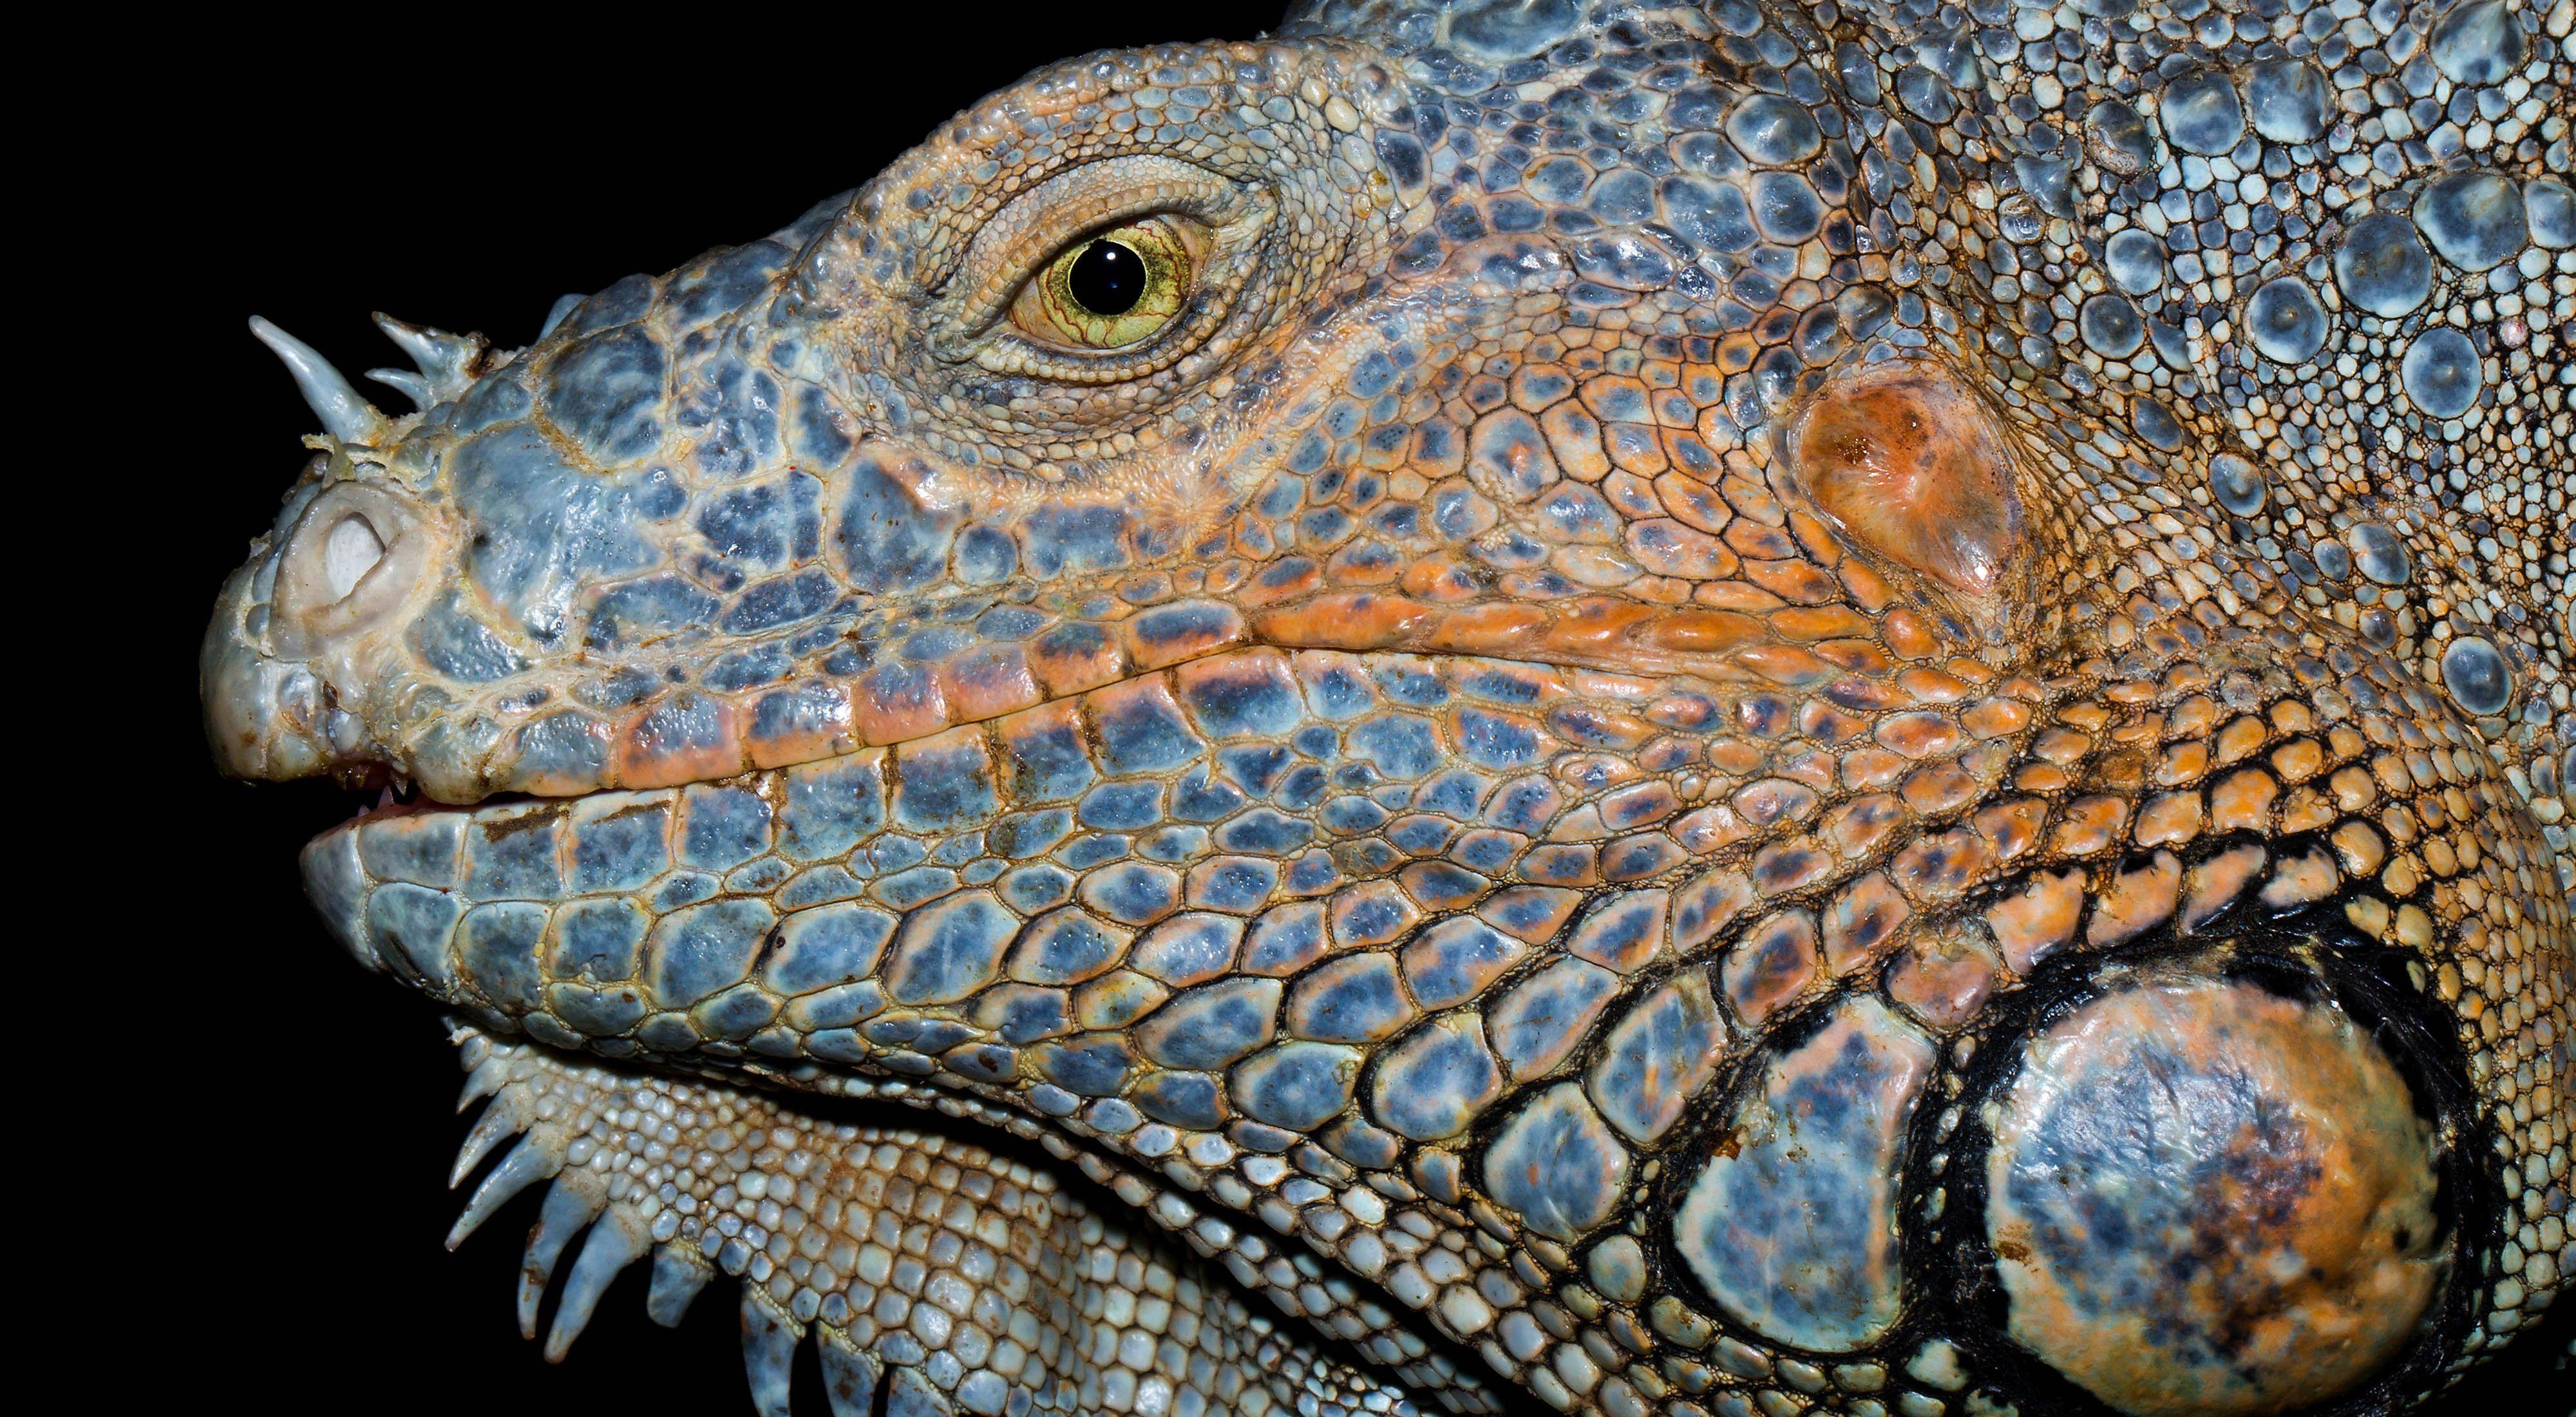 Una imagen íntima de una iguana